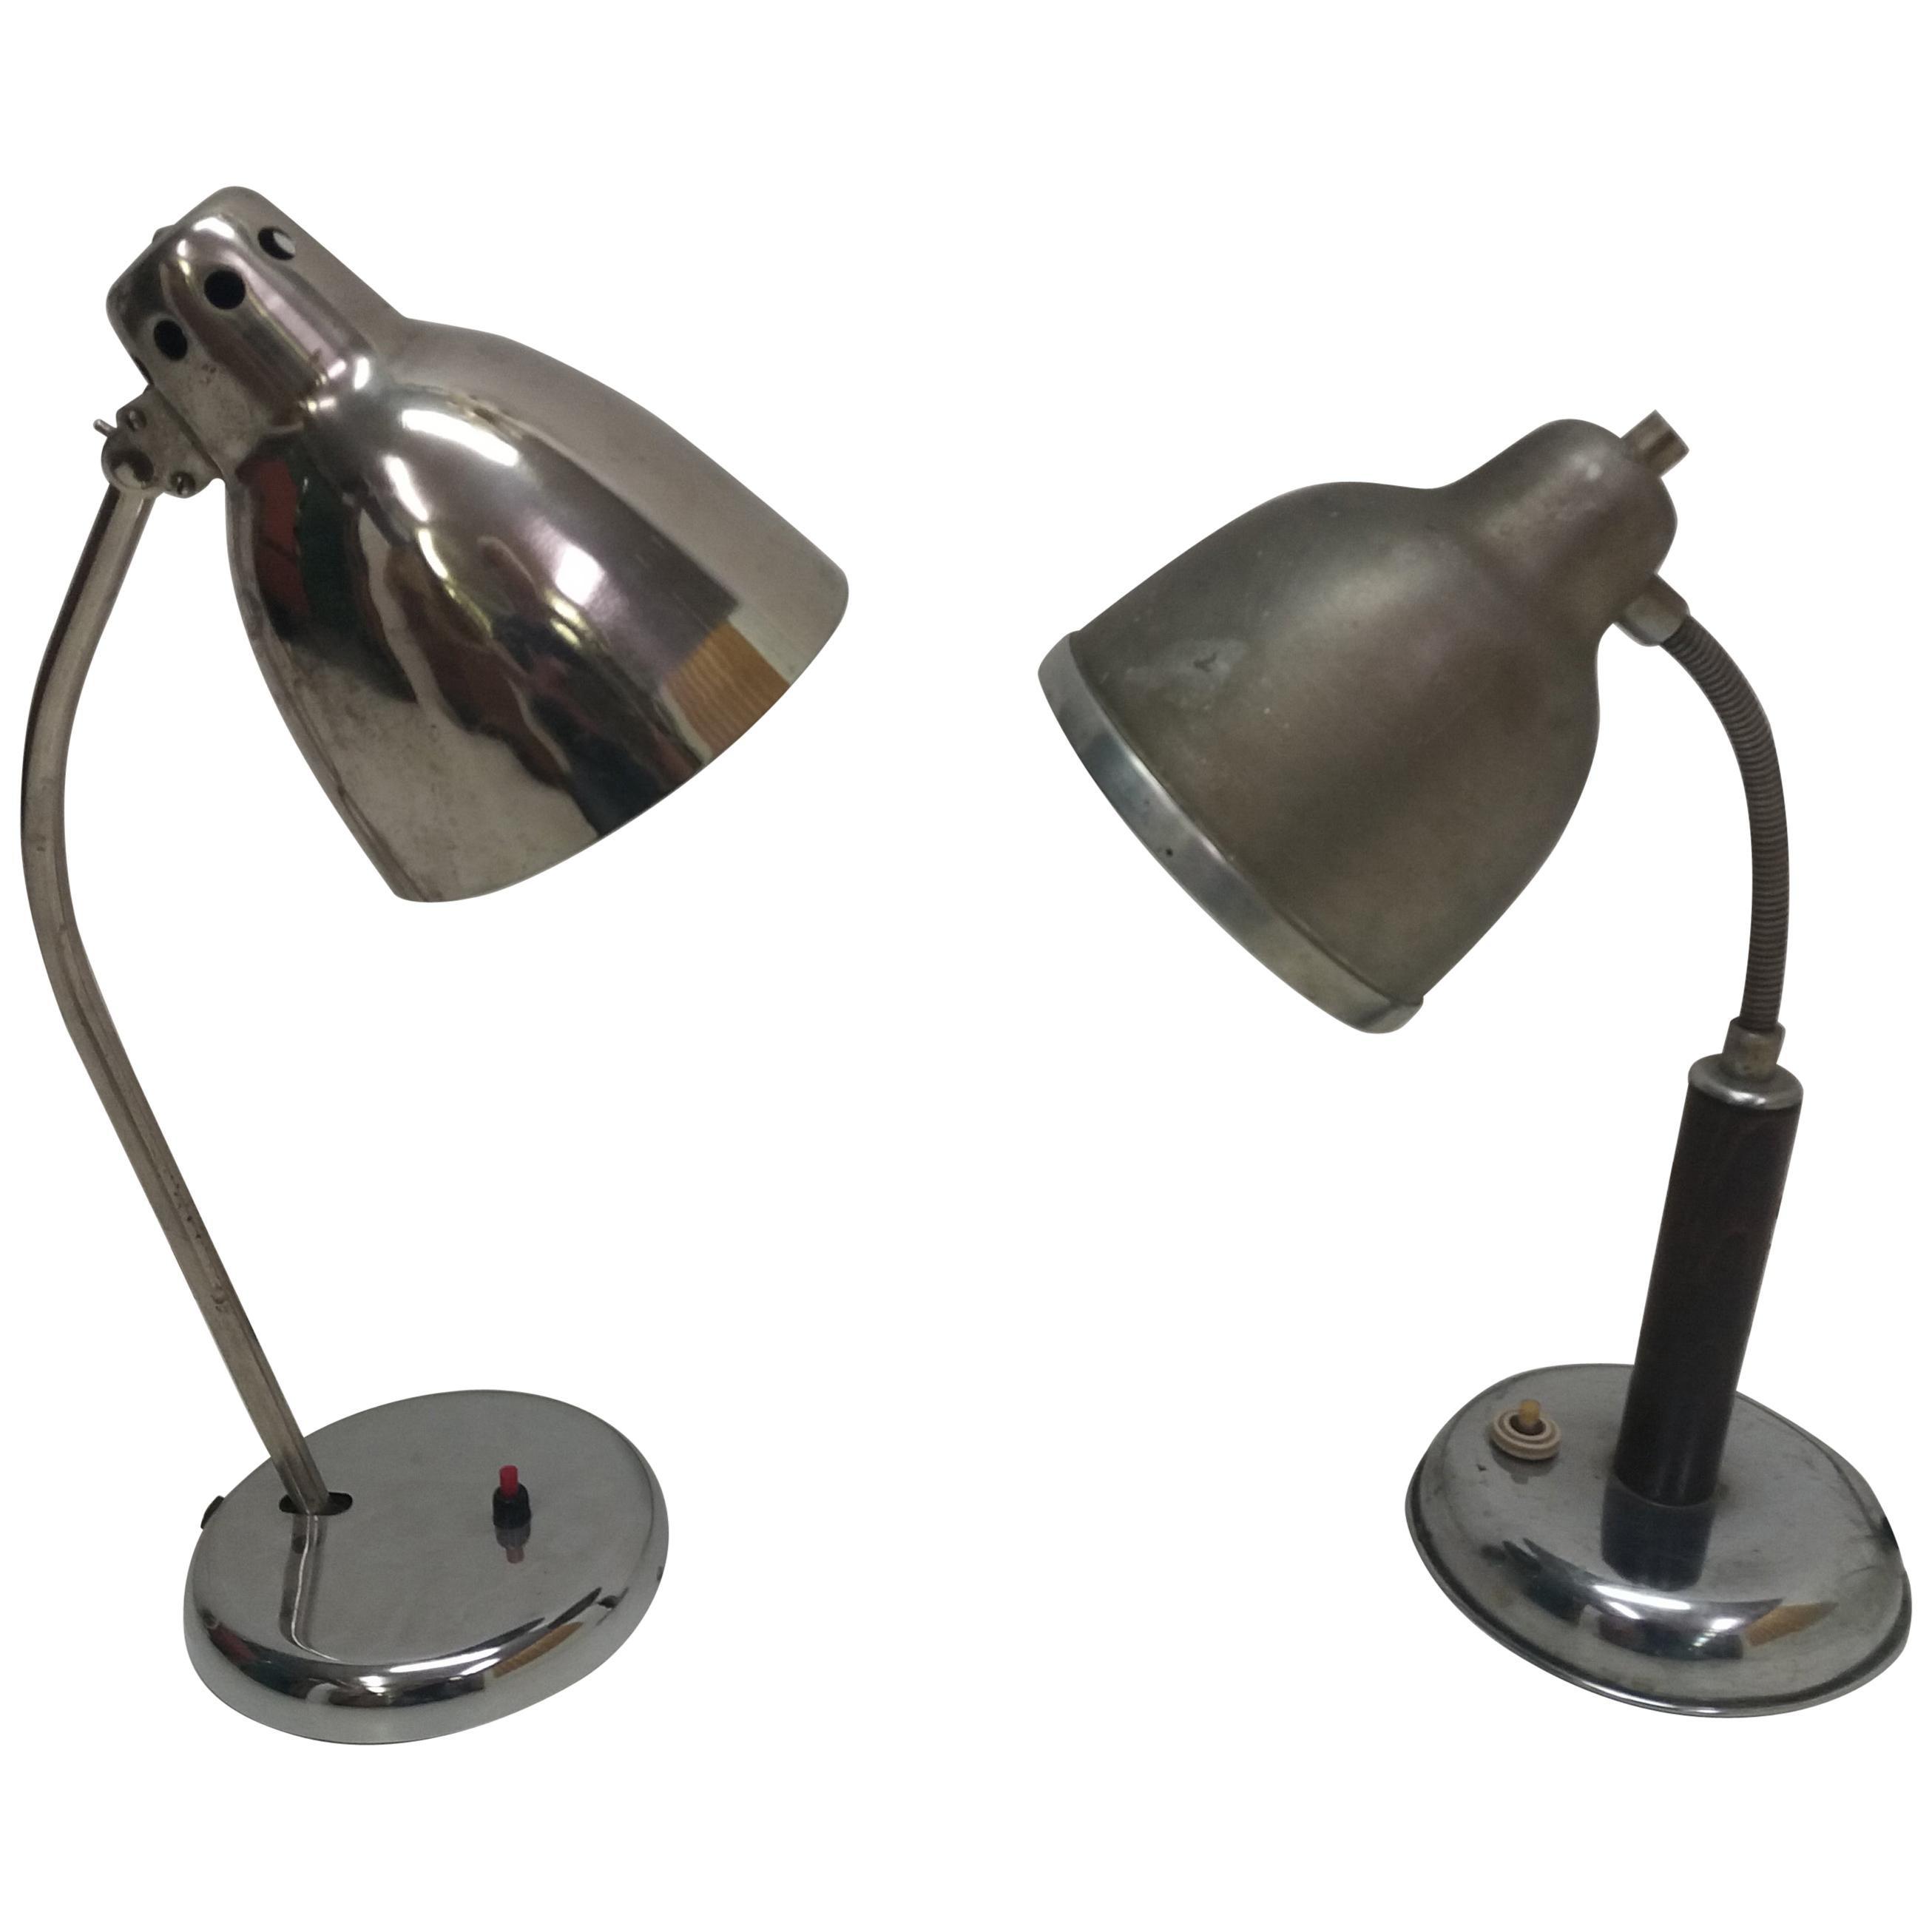 Art Deco Table Lamps, 1930s